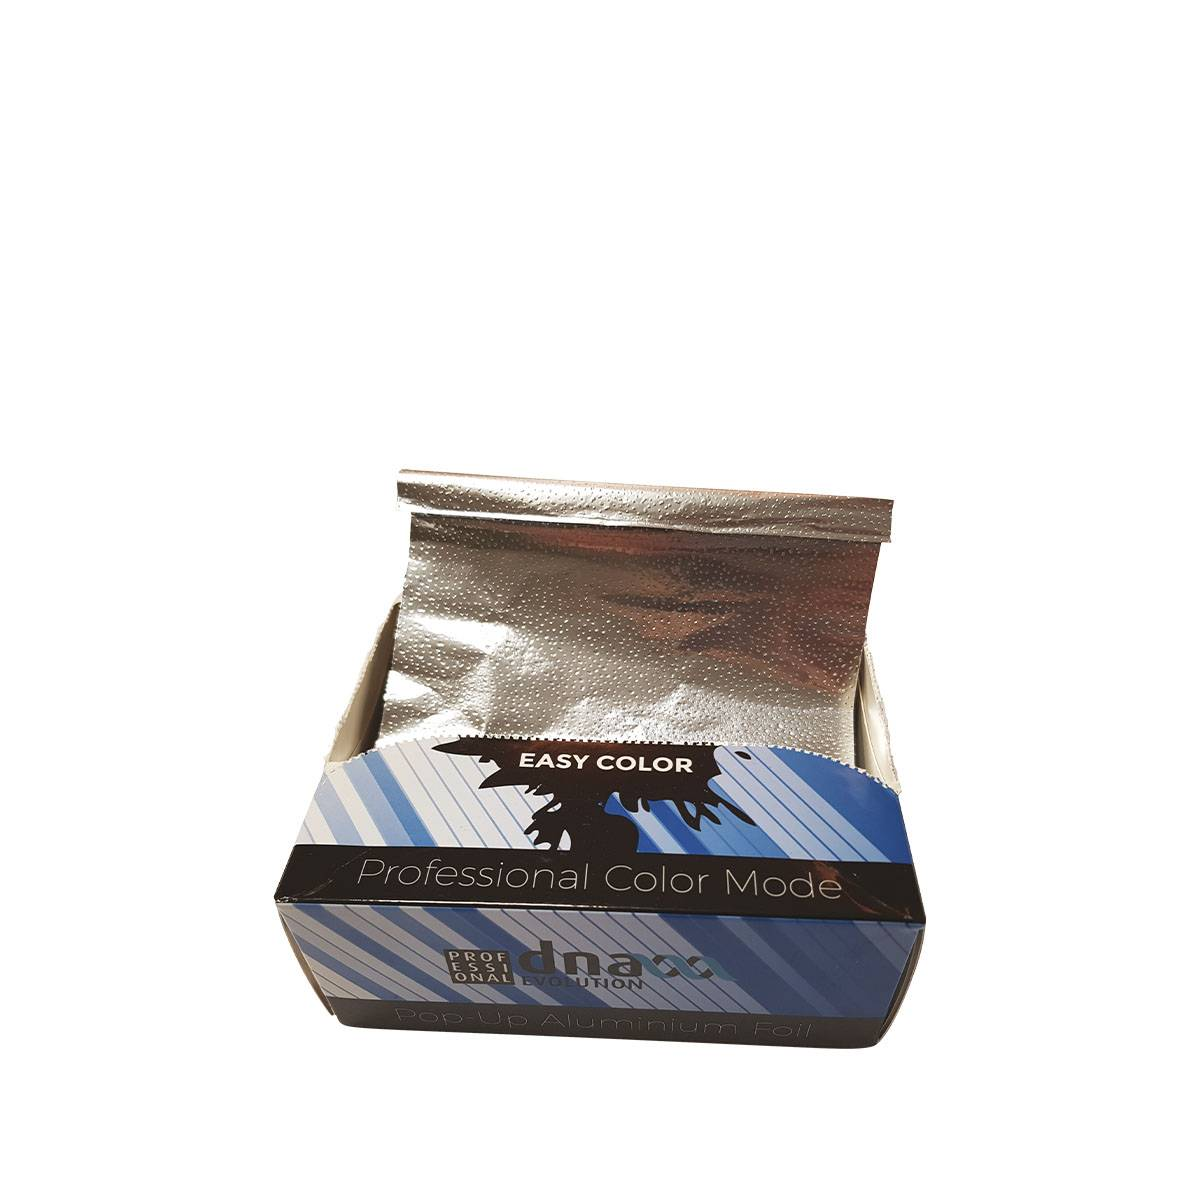 Stagnola goffrata box 200 fogli* MINUTERIA VARIA IN ASSORTIMENT